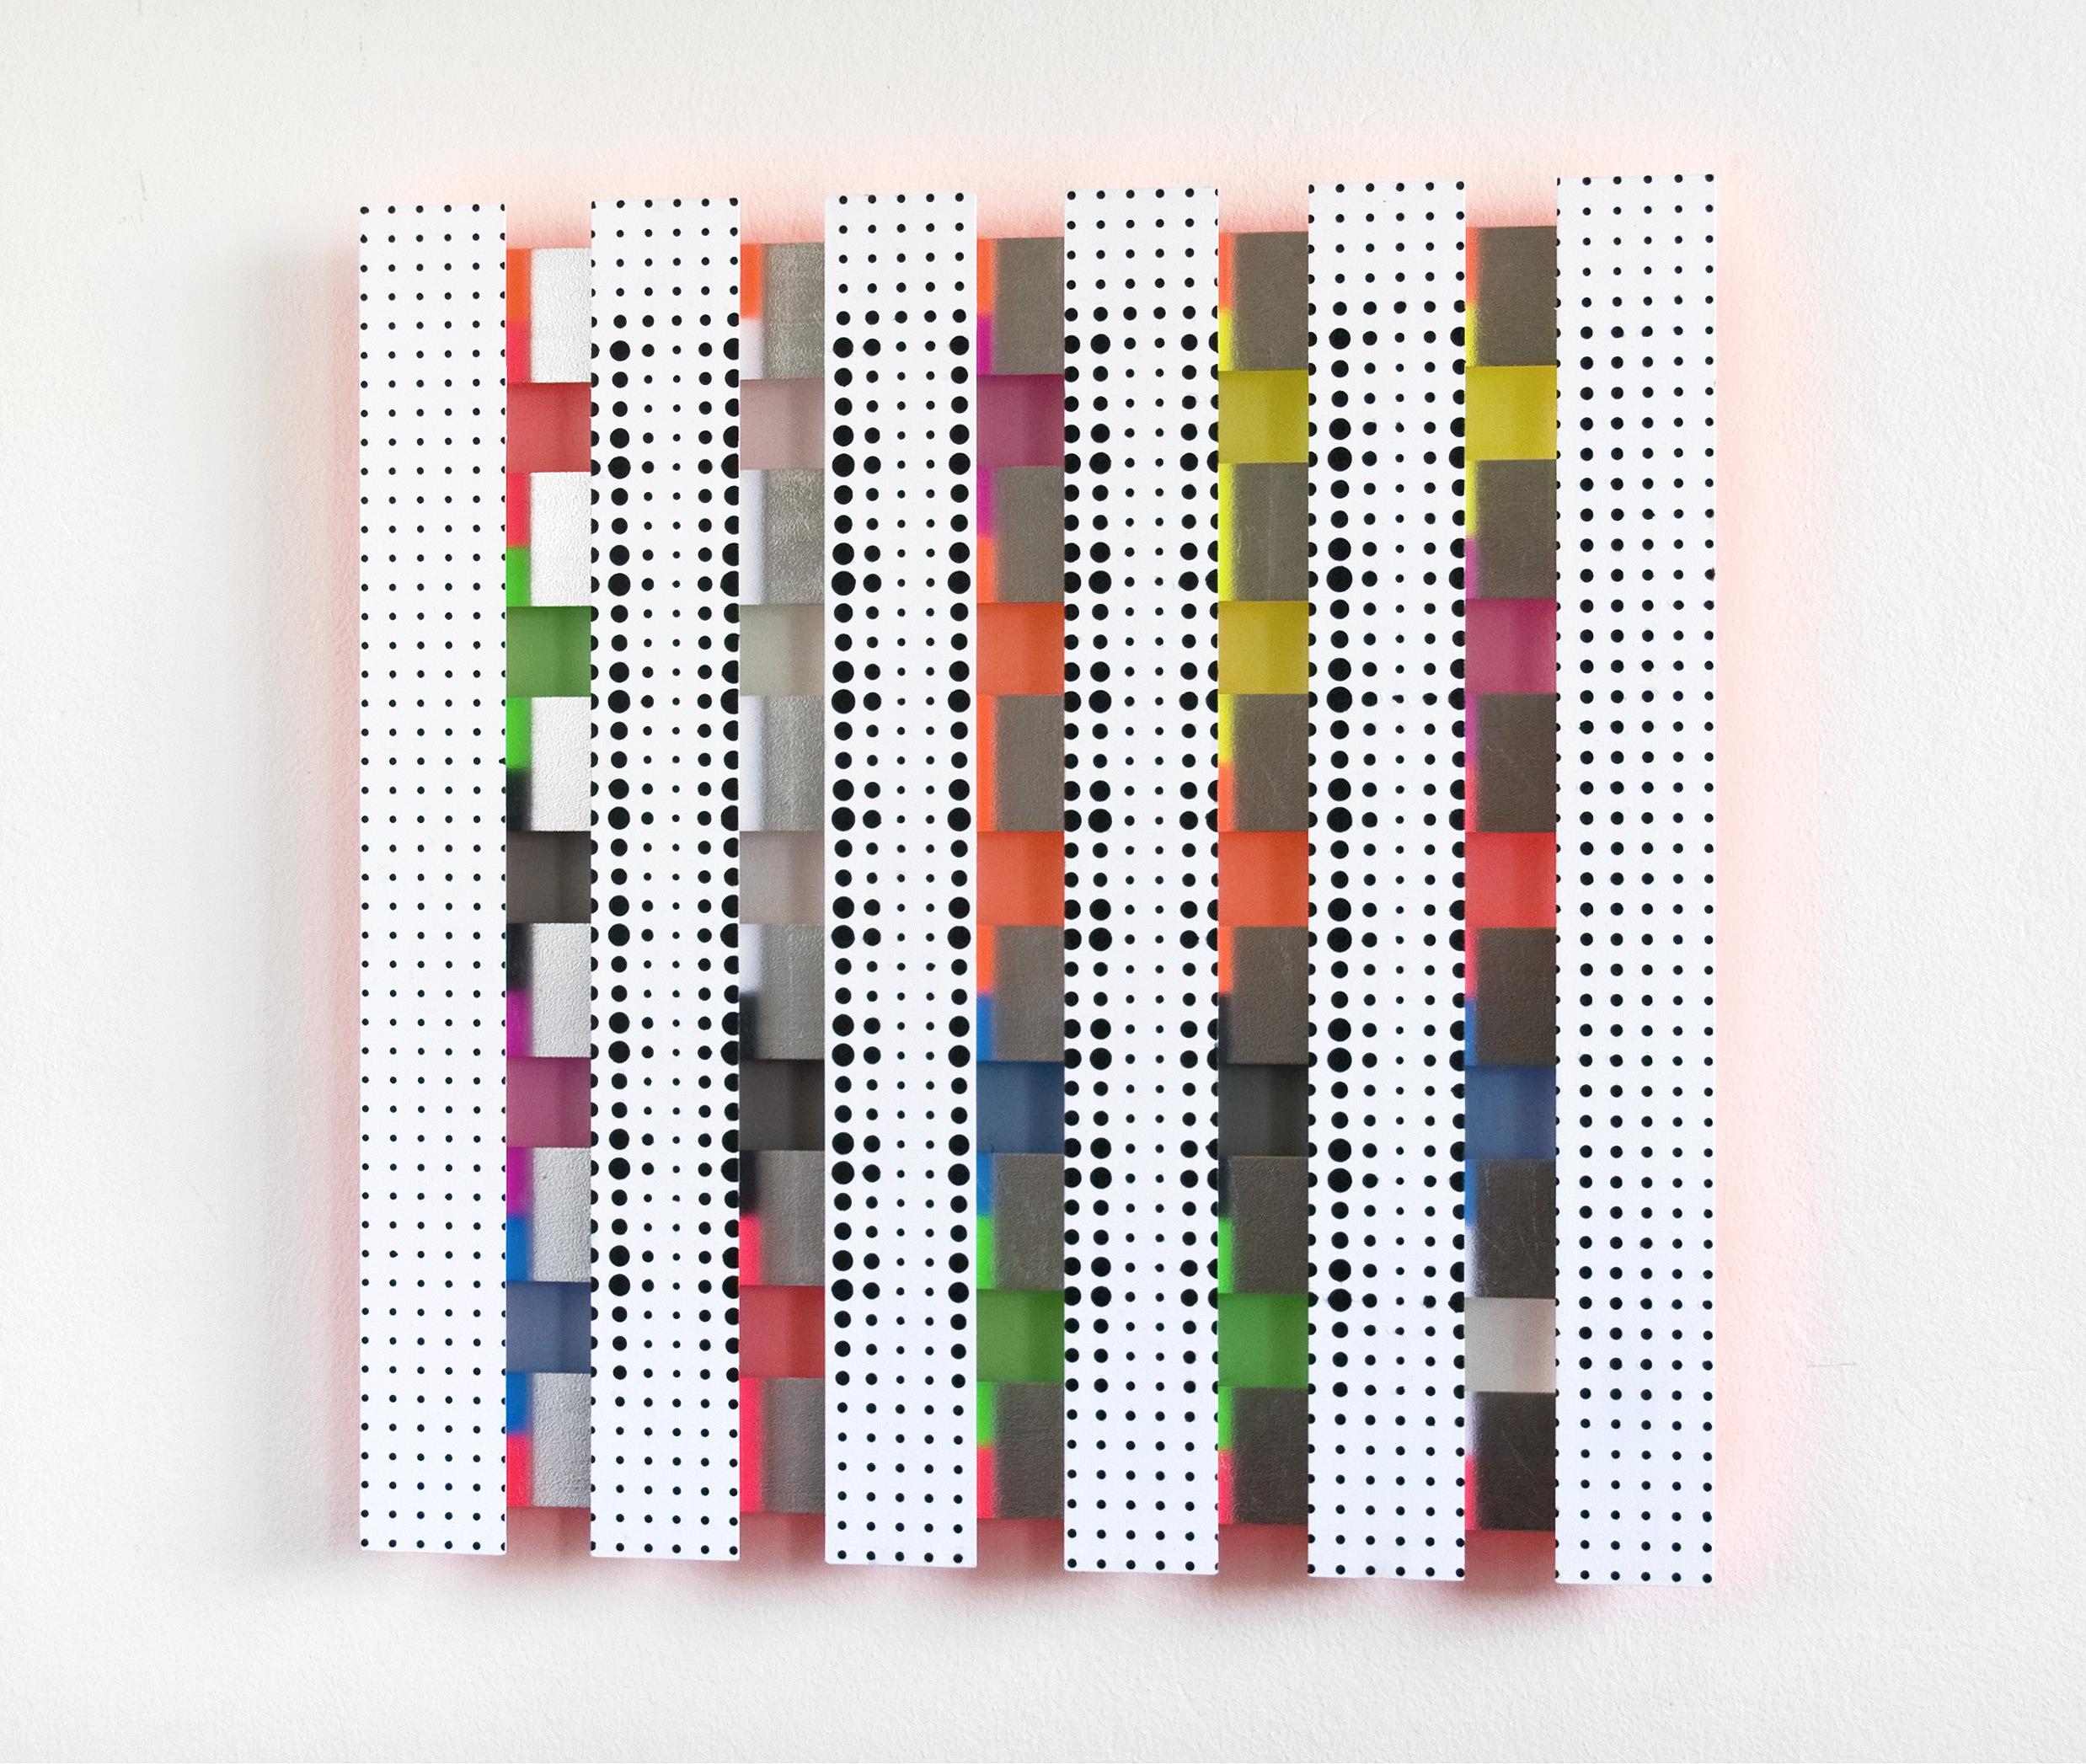 3n akril, les, 79 x 79 cm, 2010.jpg